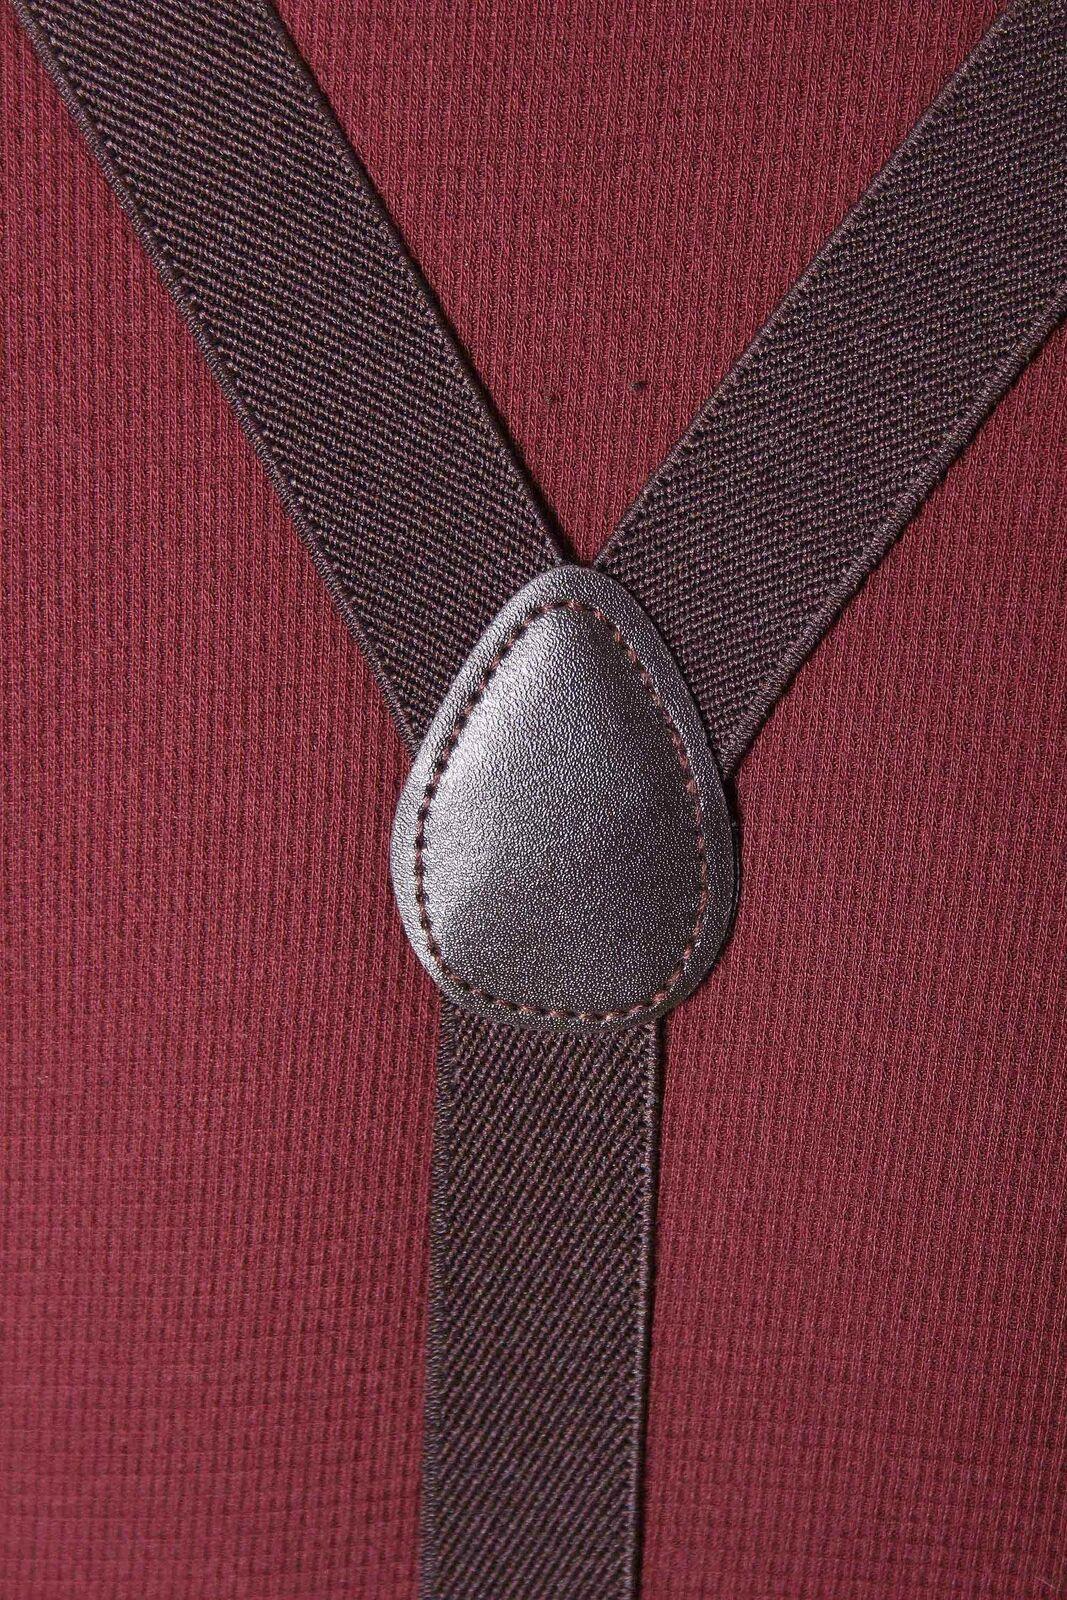 Unisex retro Rockabilly Plain einfarbig Suspenders Hosenträger m. Clips